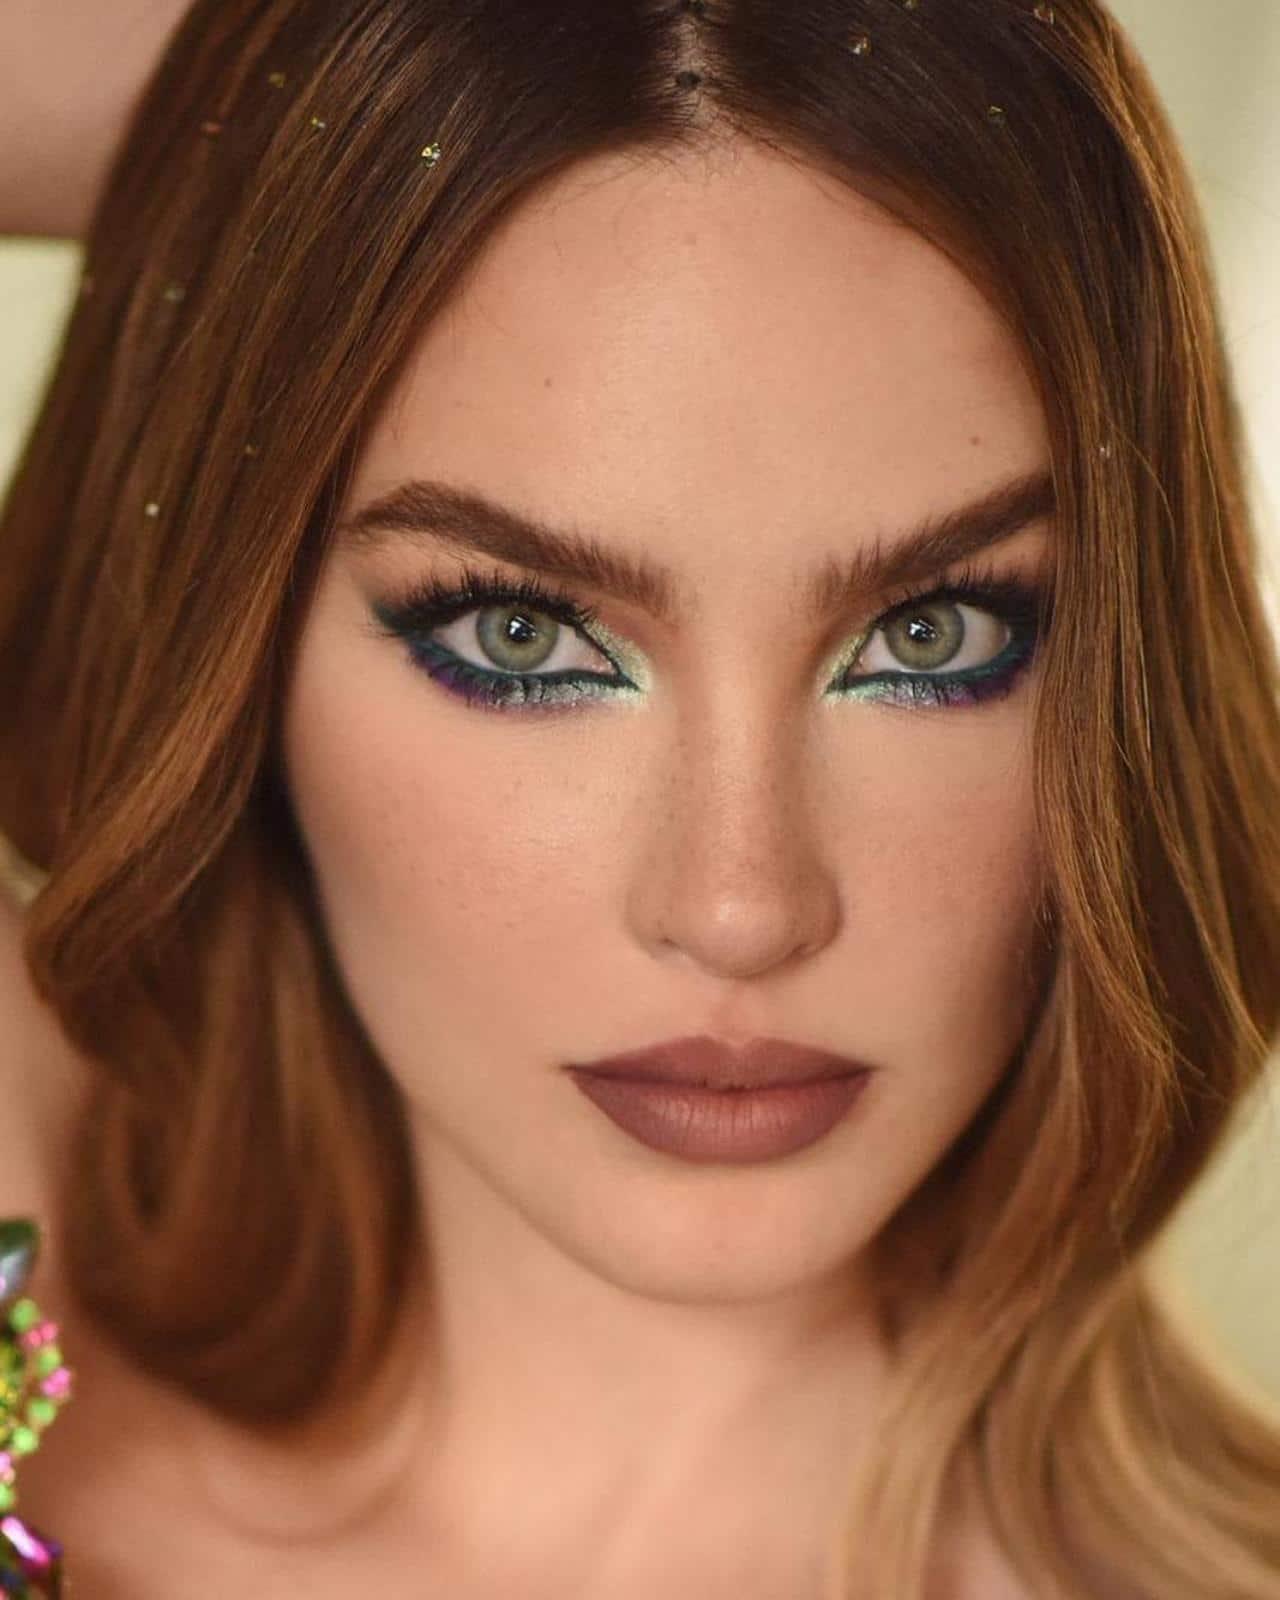 Belinda maquillada estilo hermana de Nodal